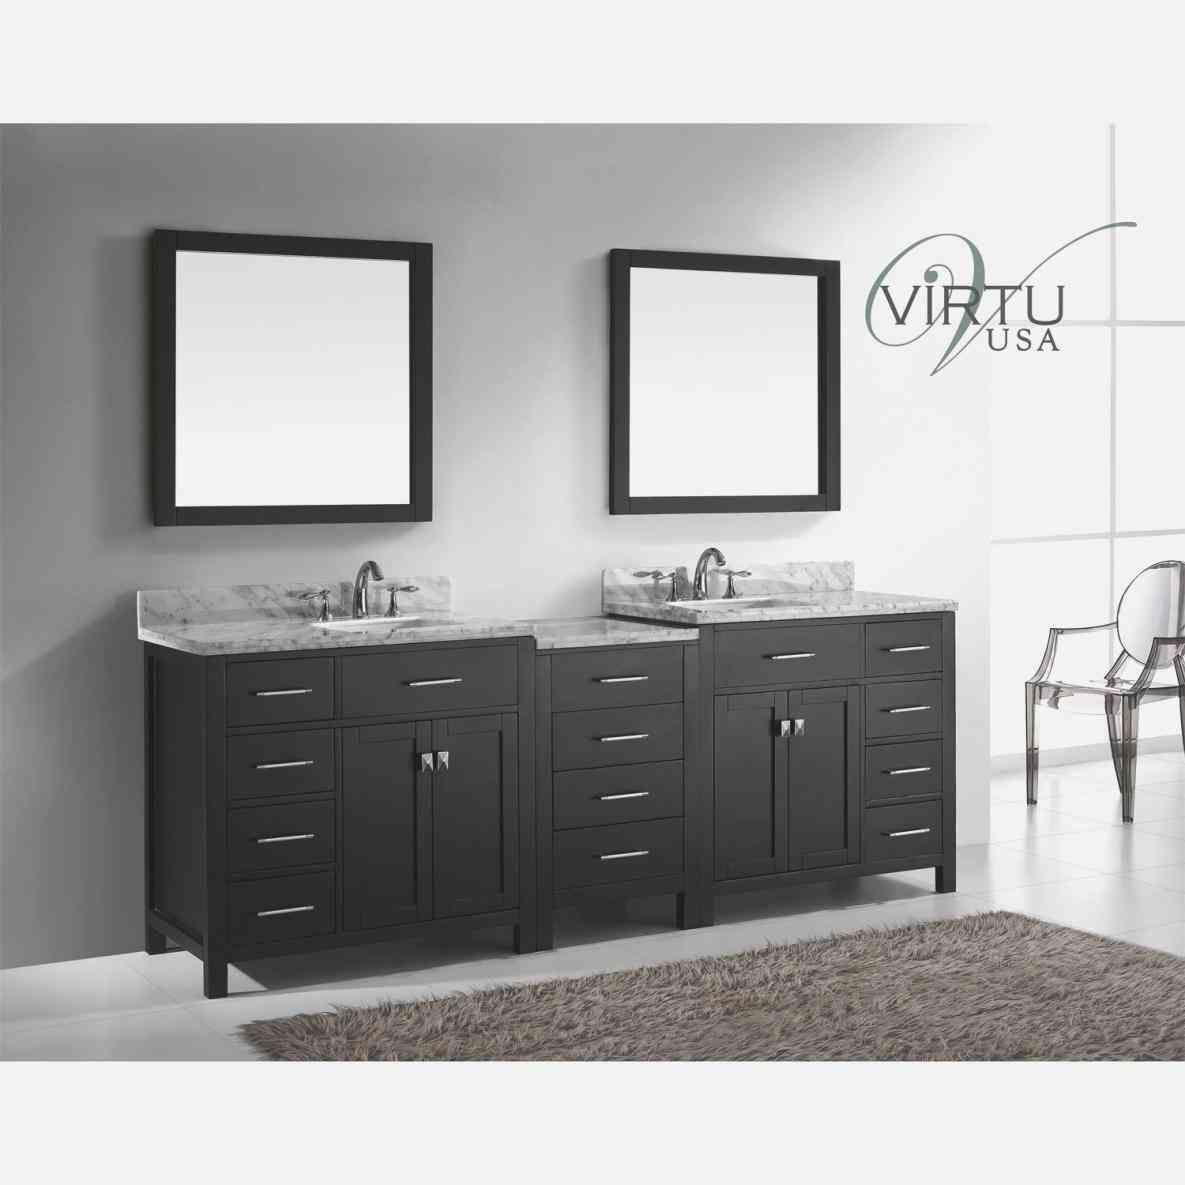 New Post 52 Inch Double Sink Bathroom Vanity Bathroom Ideas